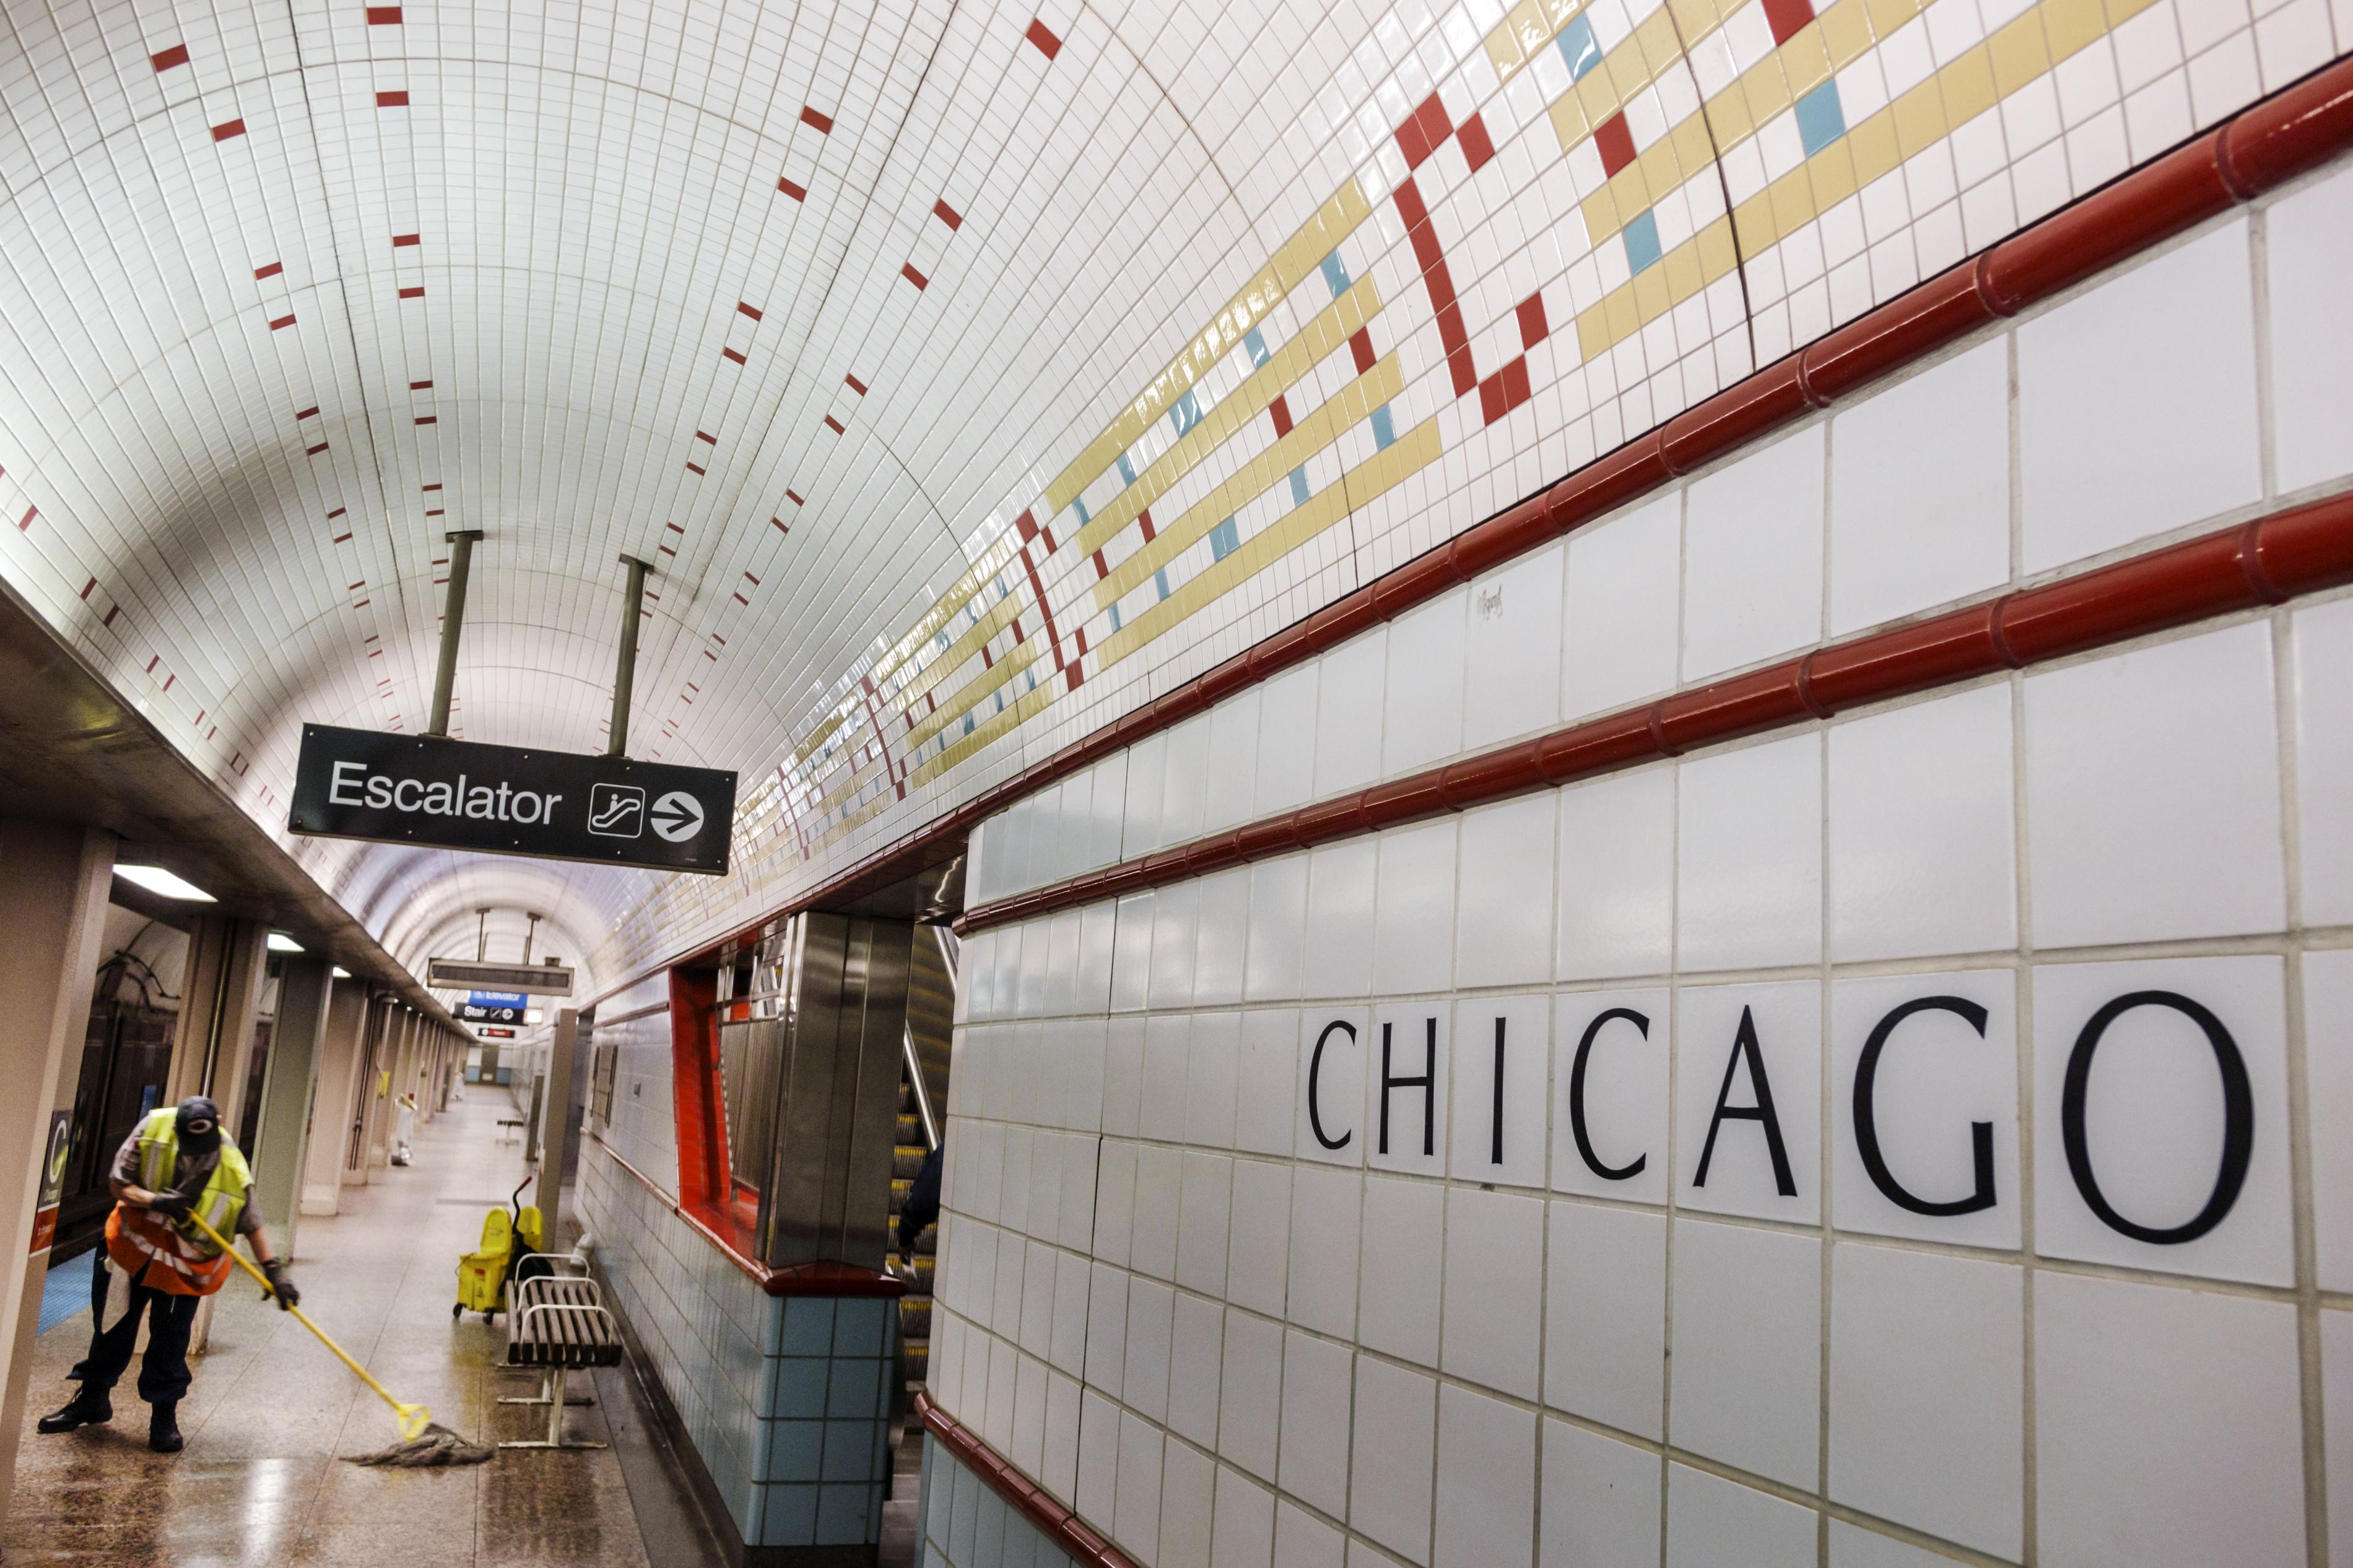 Chicago station escalator sign.